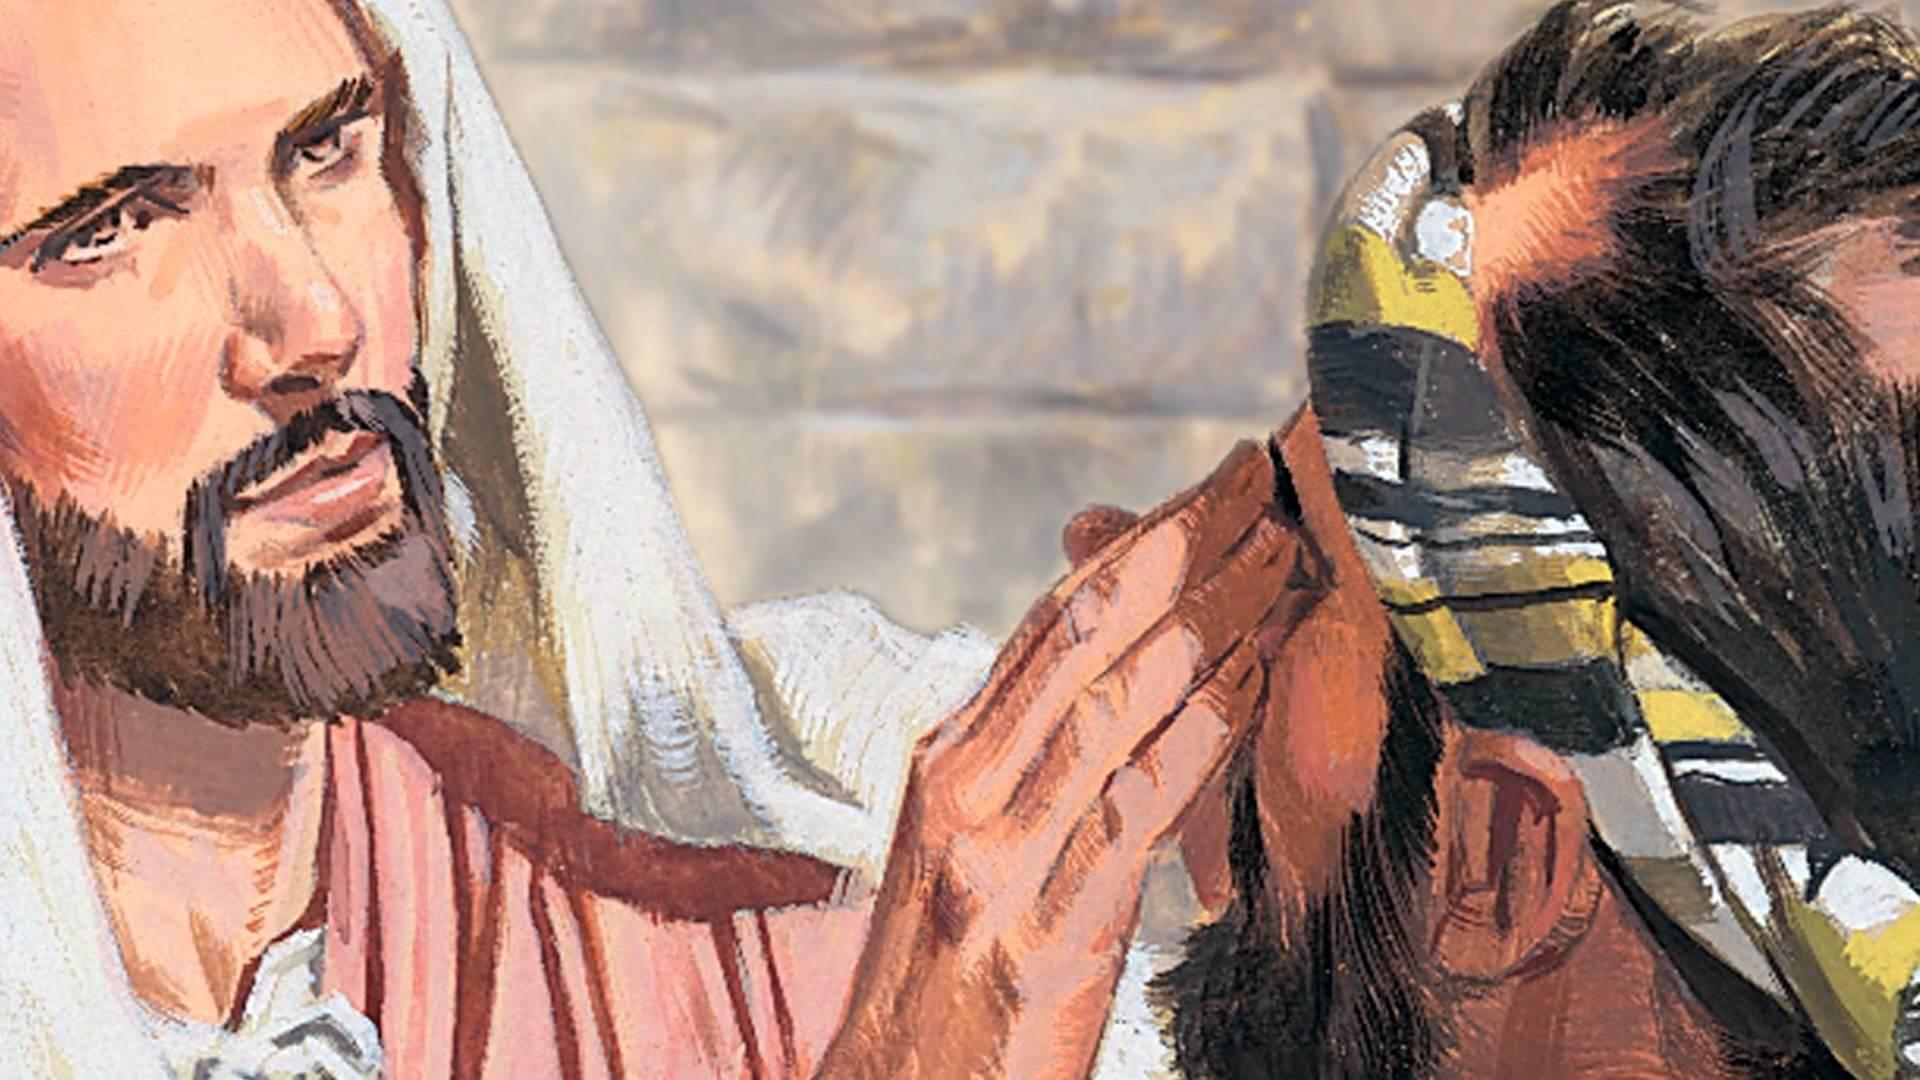 La Parola del giorno dal Vangelo secondo Luca 7,19-23.